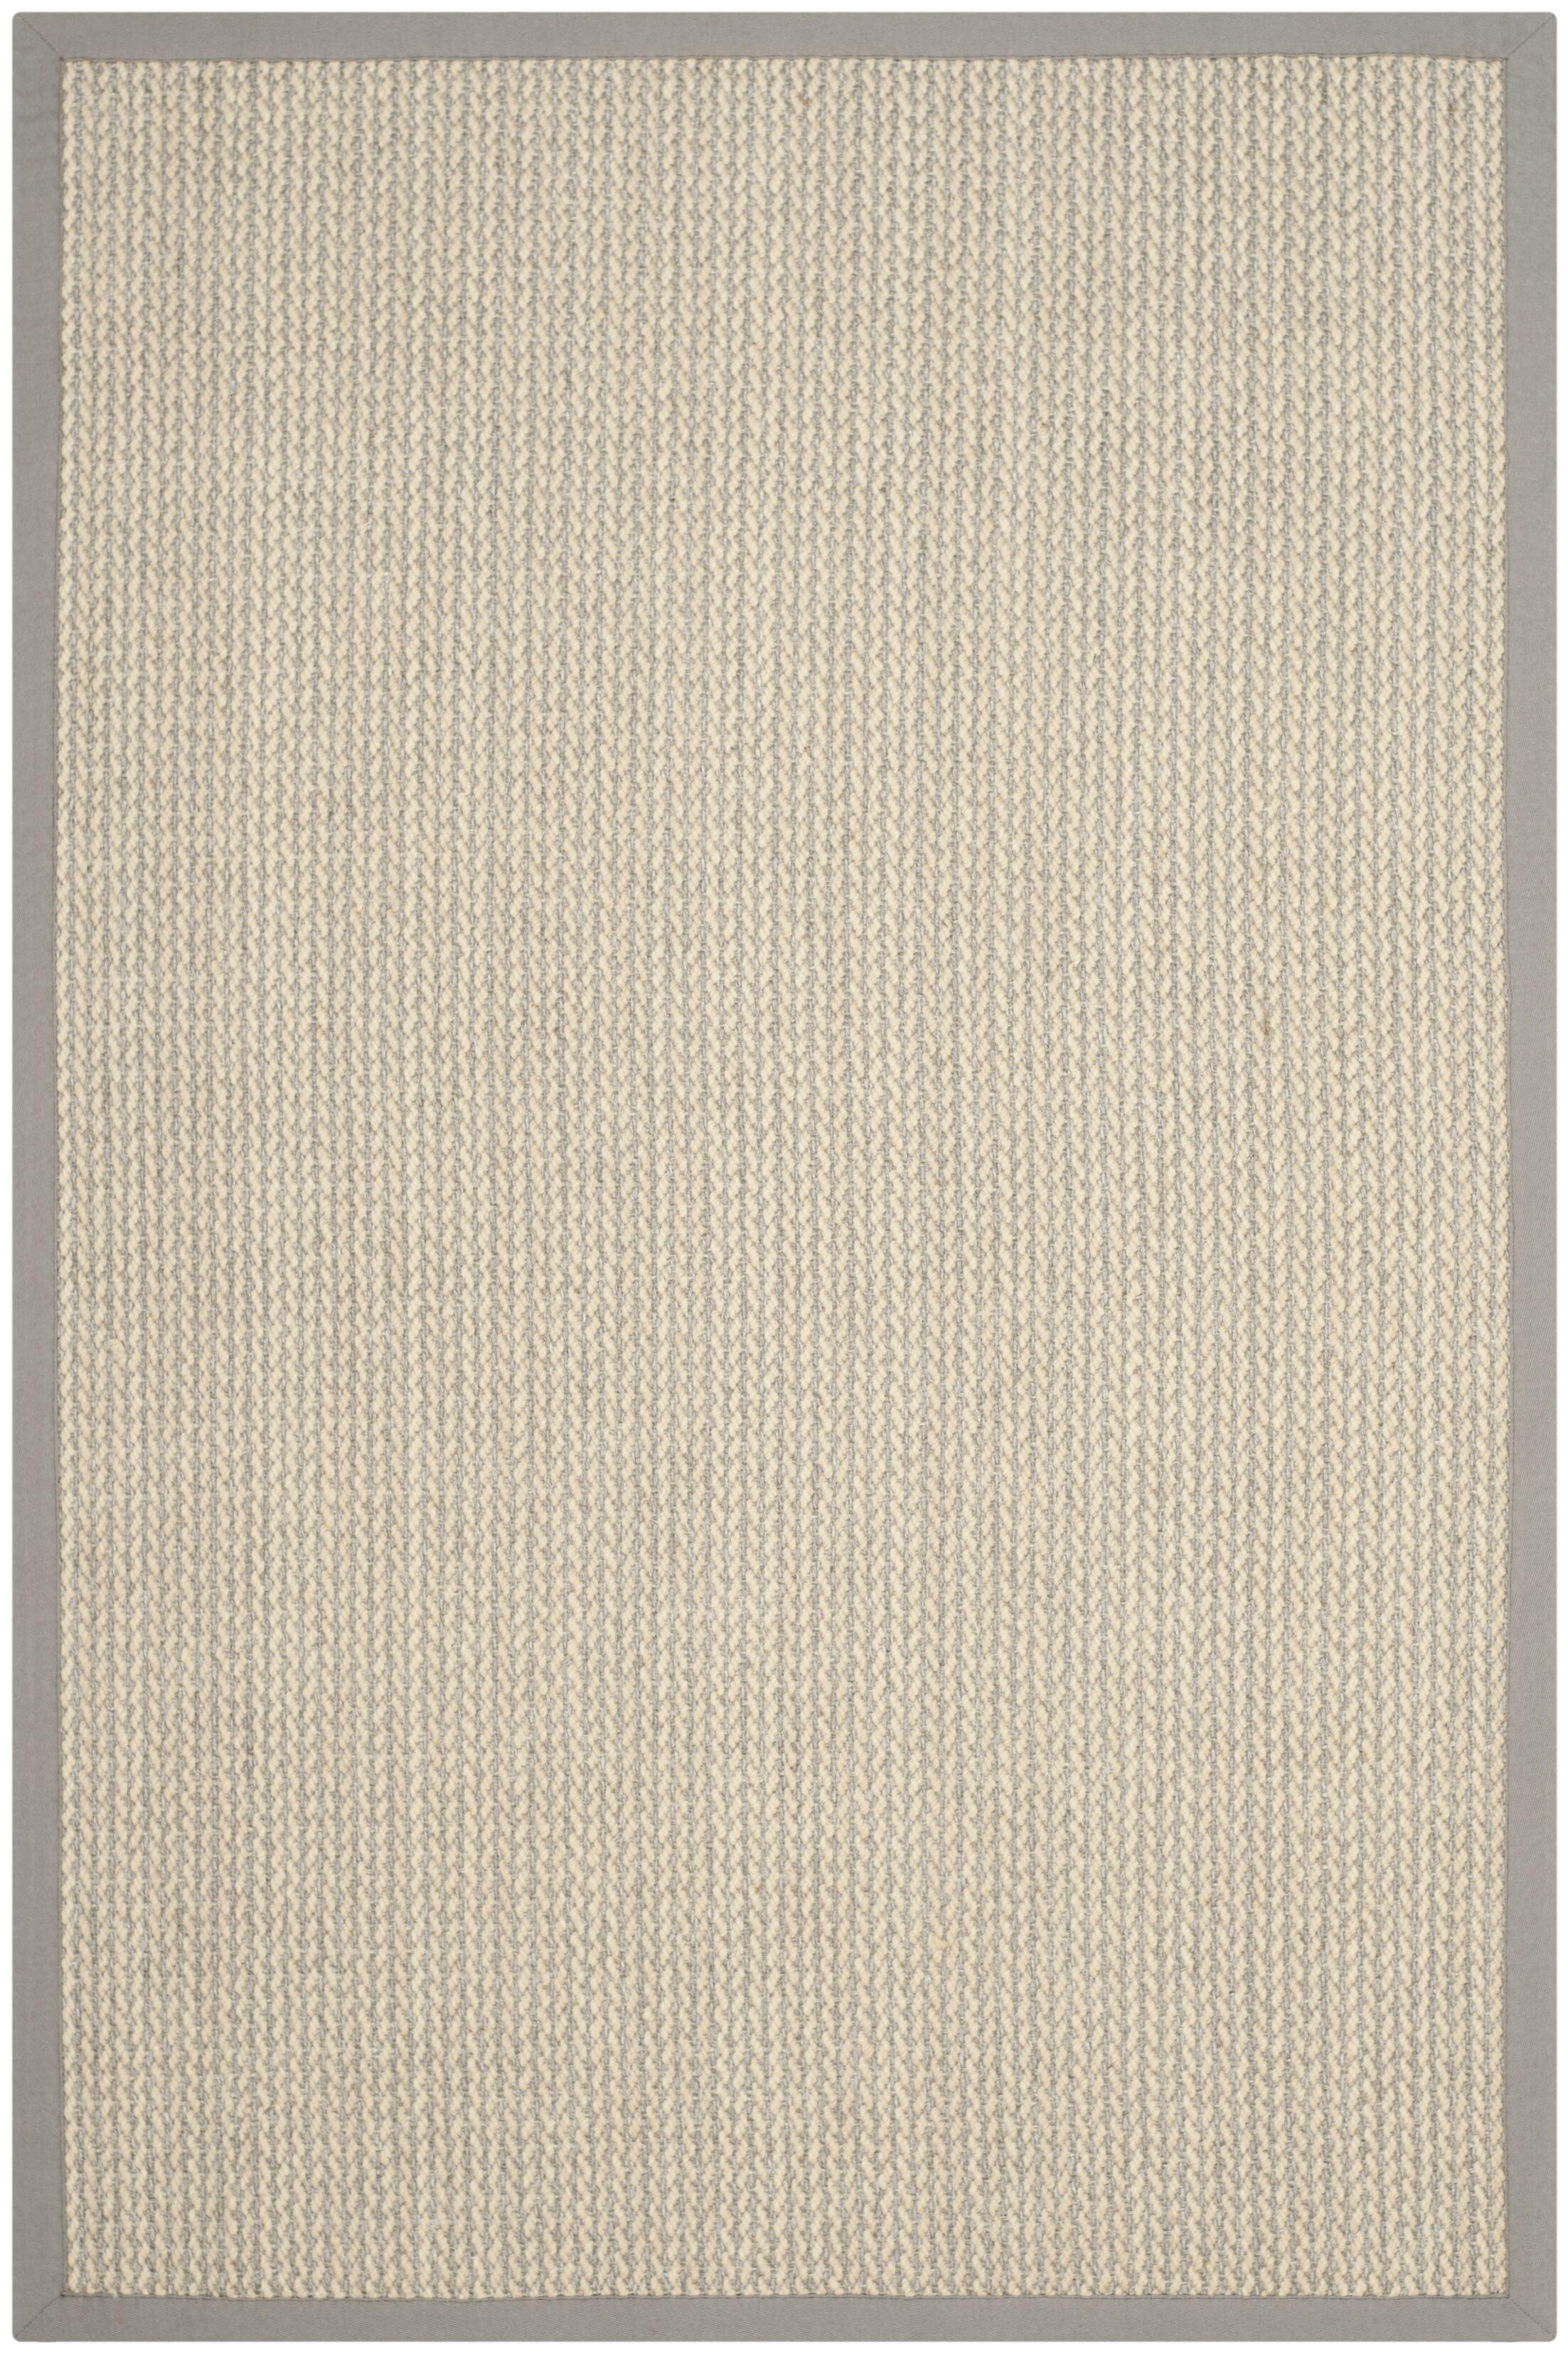 Hand-Woven Gray Area Rug Rug Size: Rectangle 5' x 8'